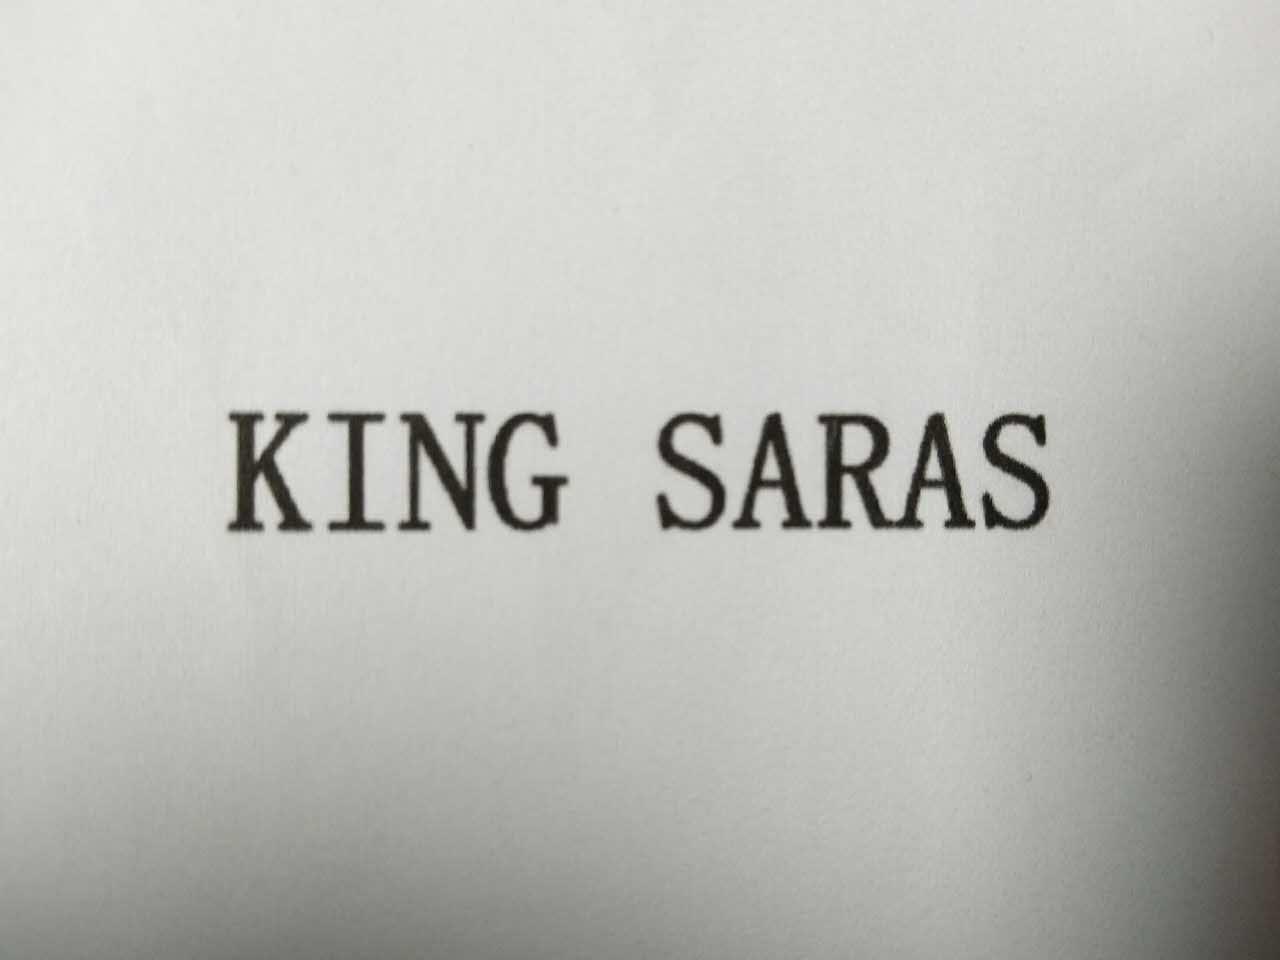 KING SARAS